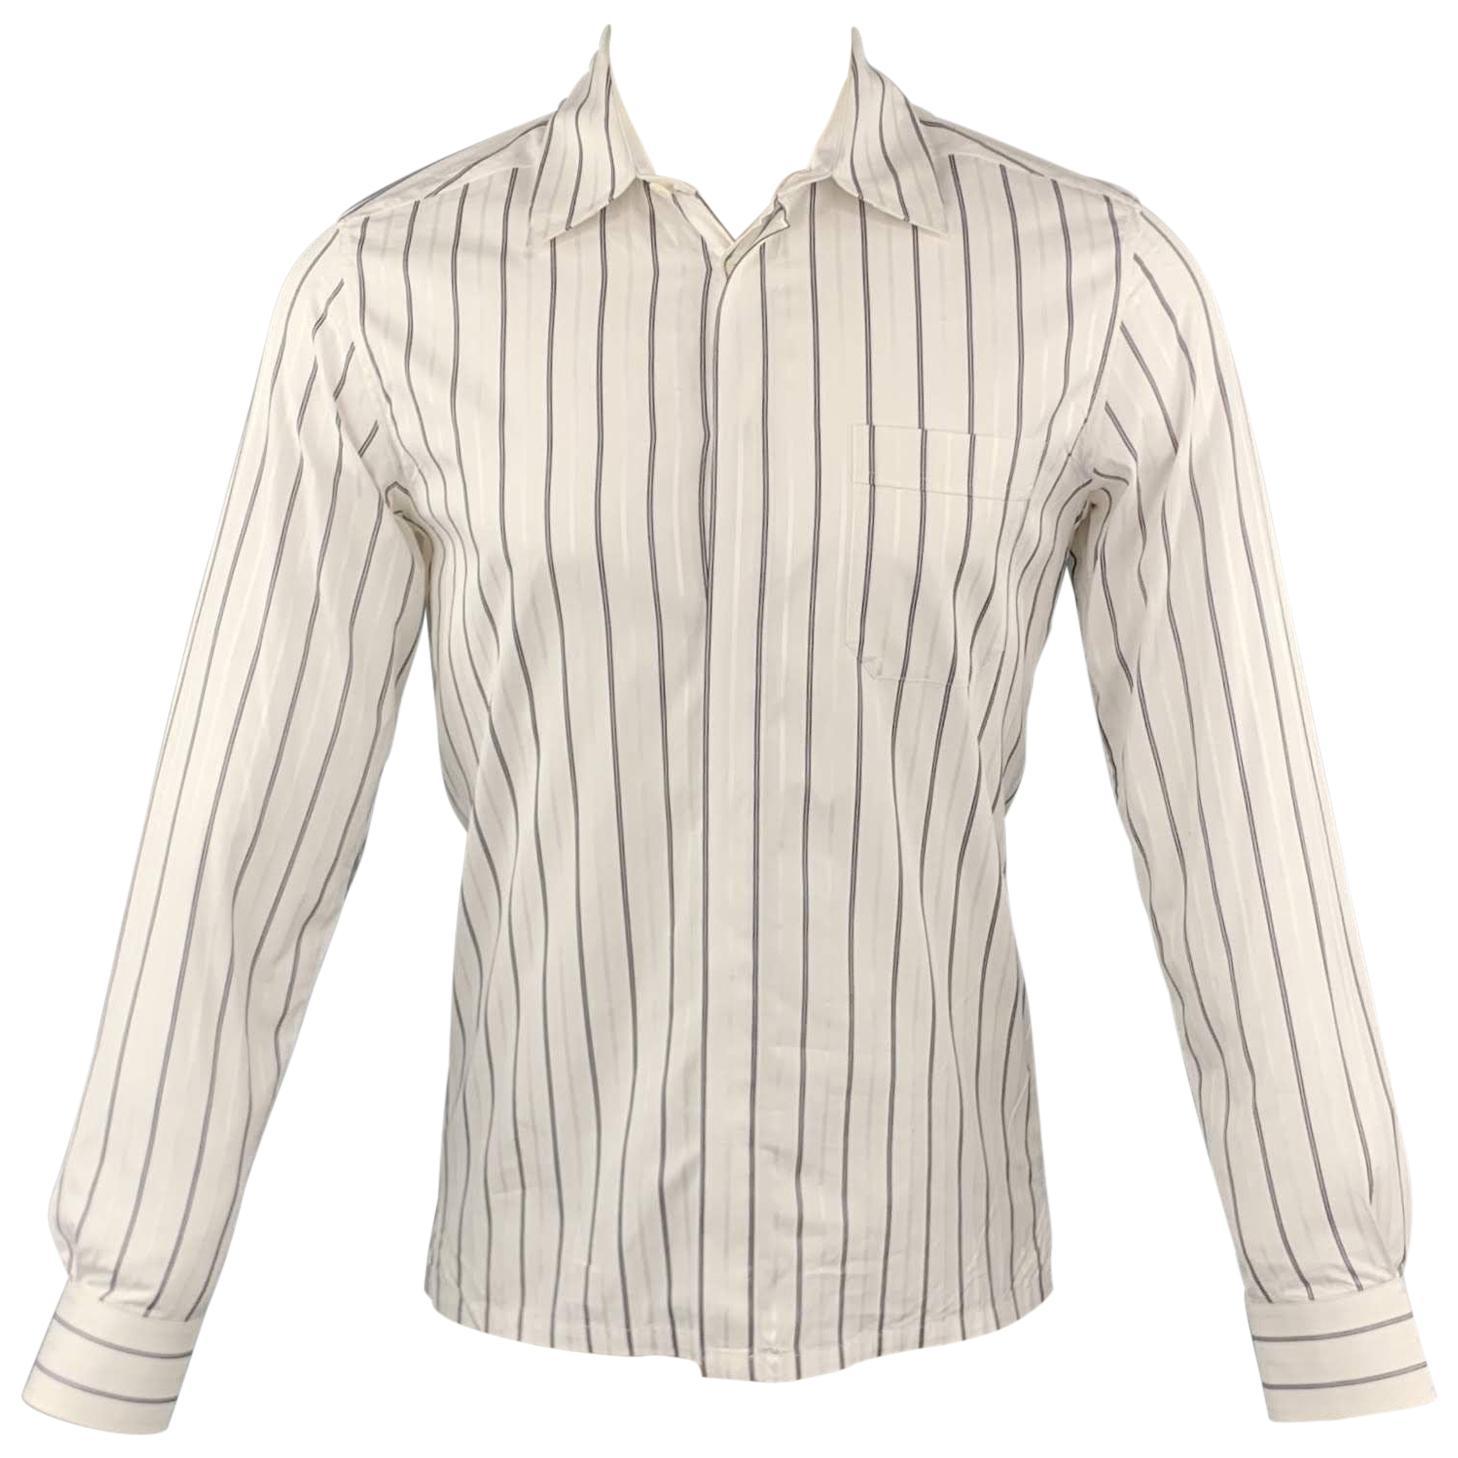 KRIS VAN ASSCHE Size XS White & Navy Stripe Cotton Long Sleeve Shirt